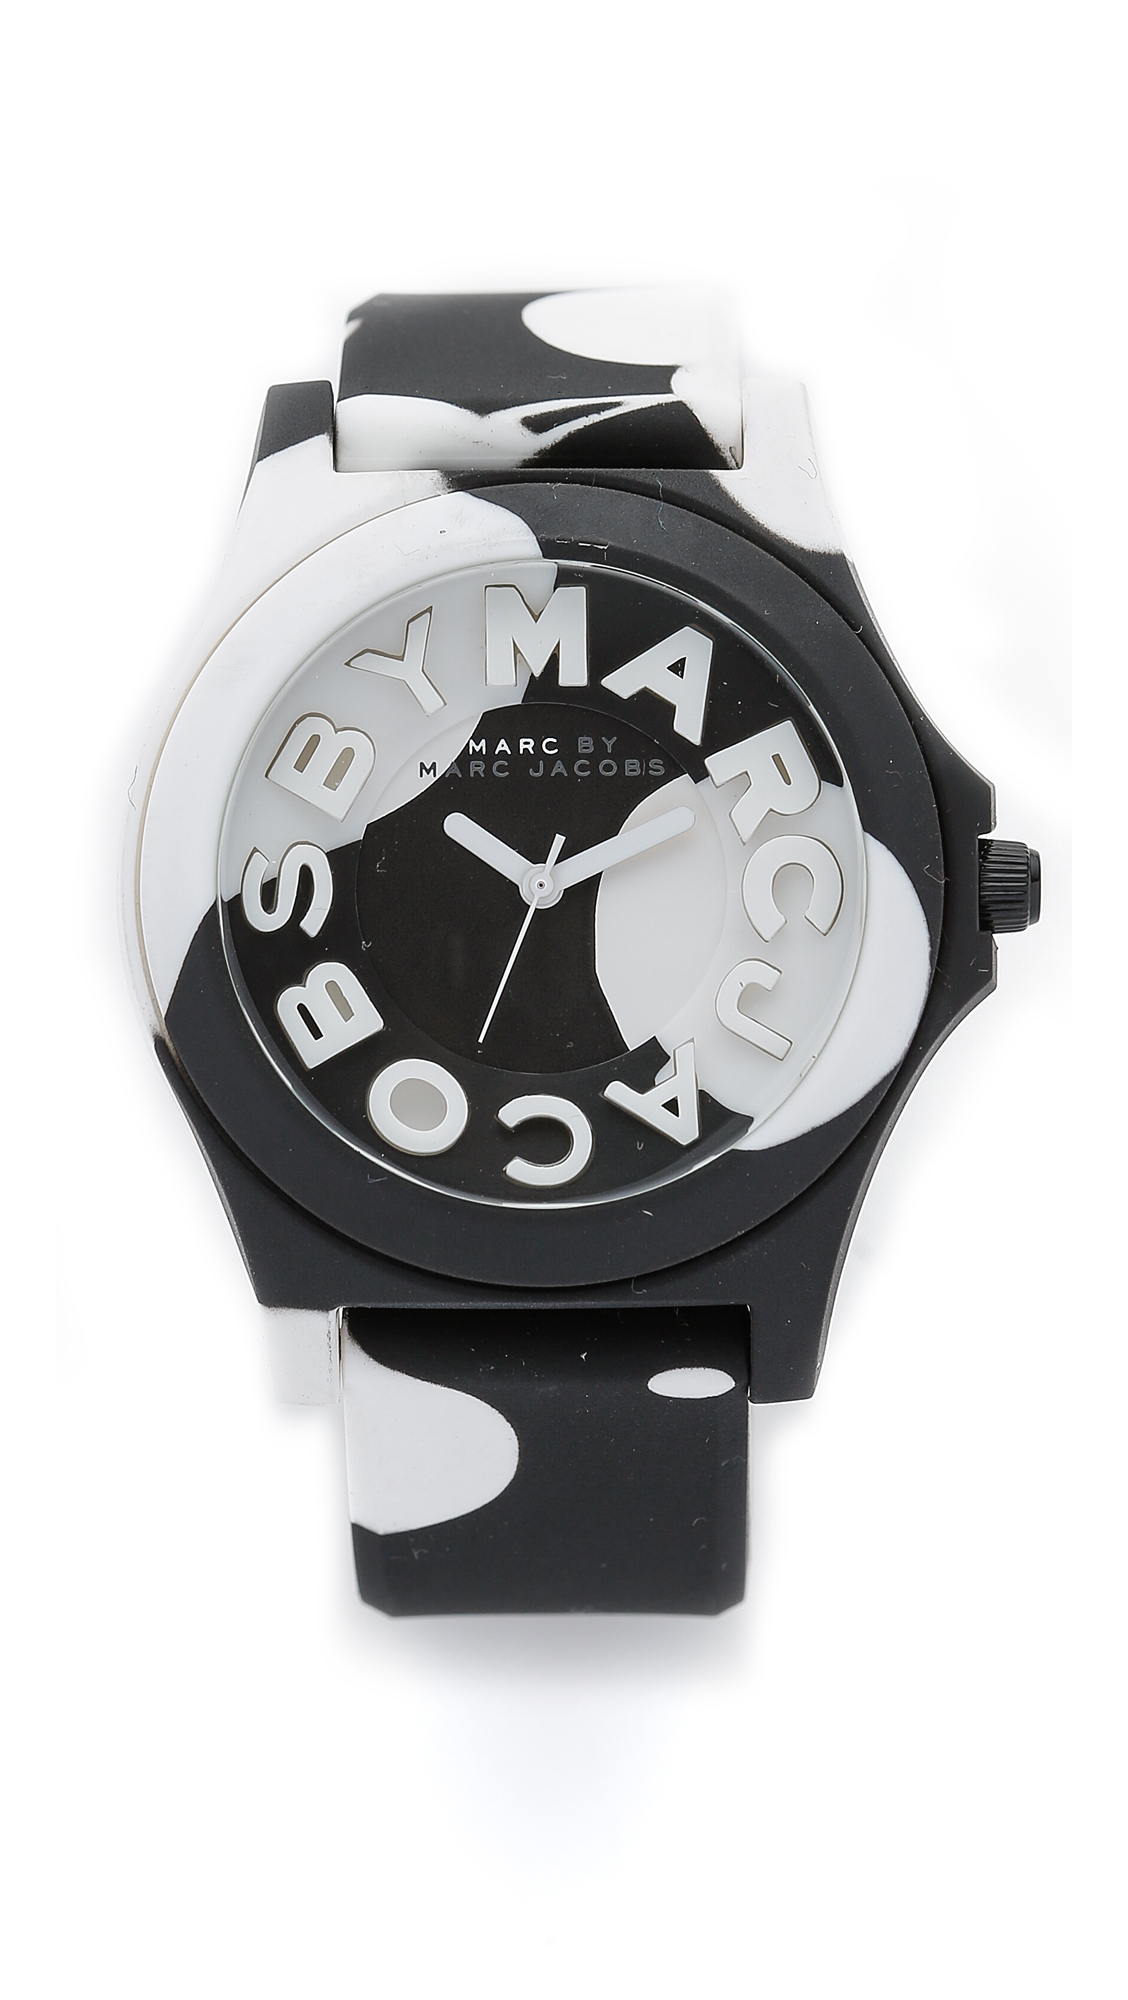 cd2ef71646a Lyst - Marc By Marc Jacobs Sloane Watch - Black white Oil Drop in Black